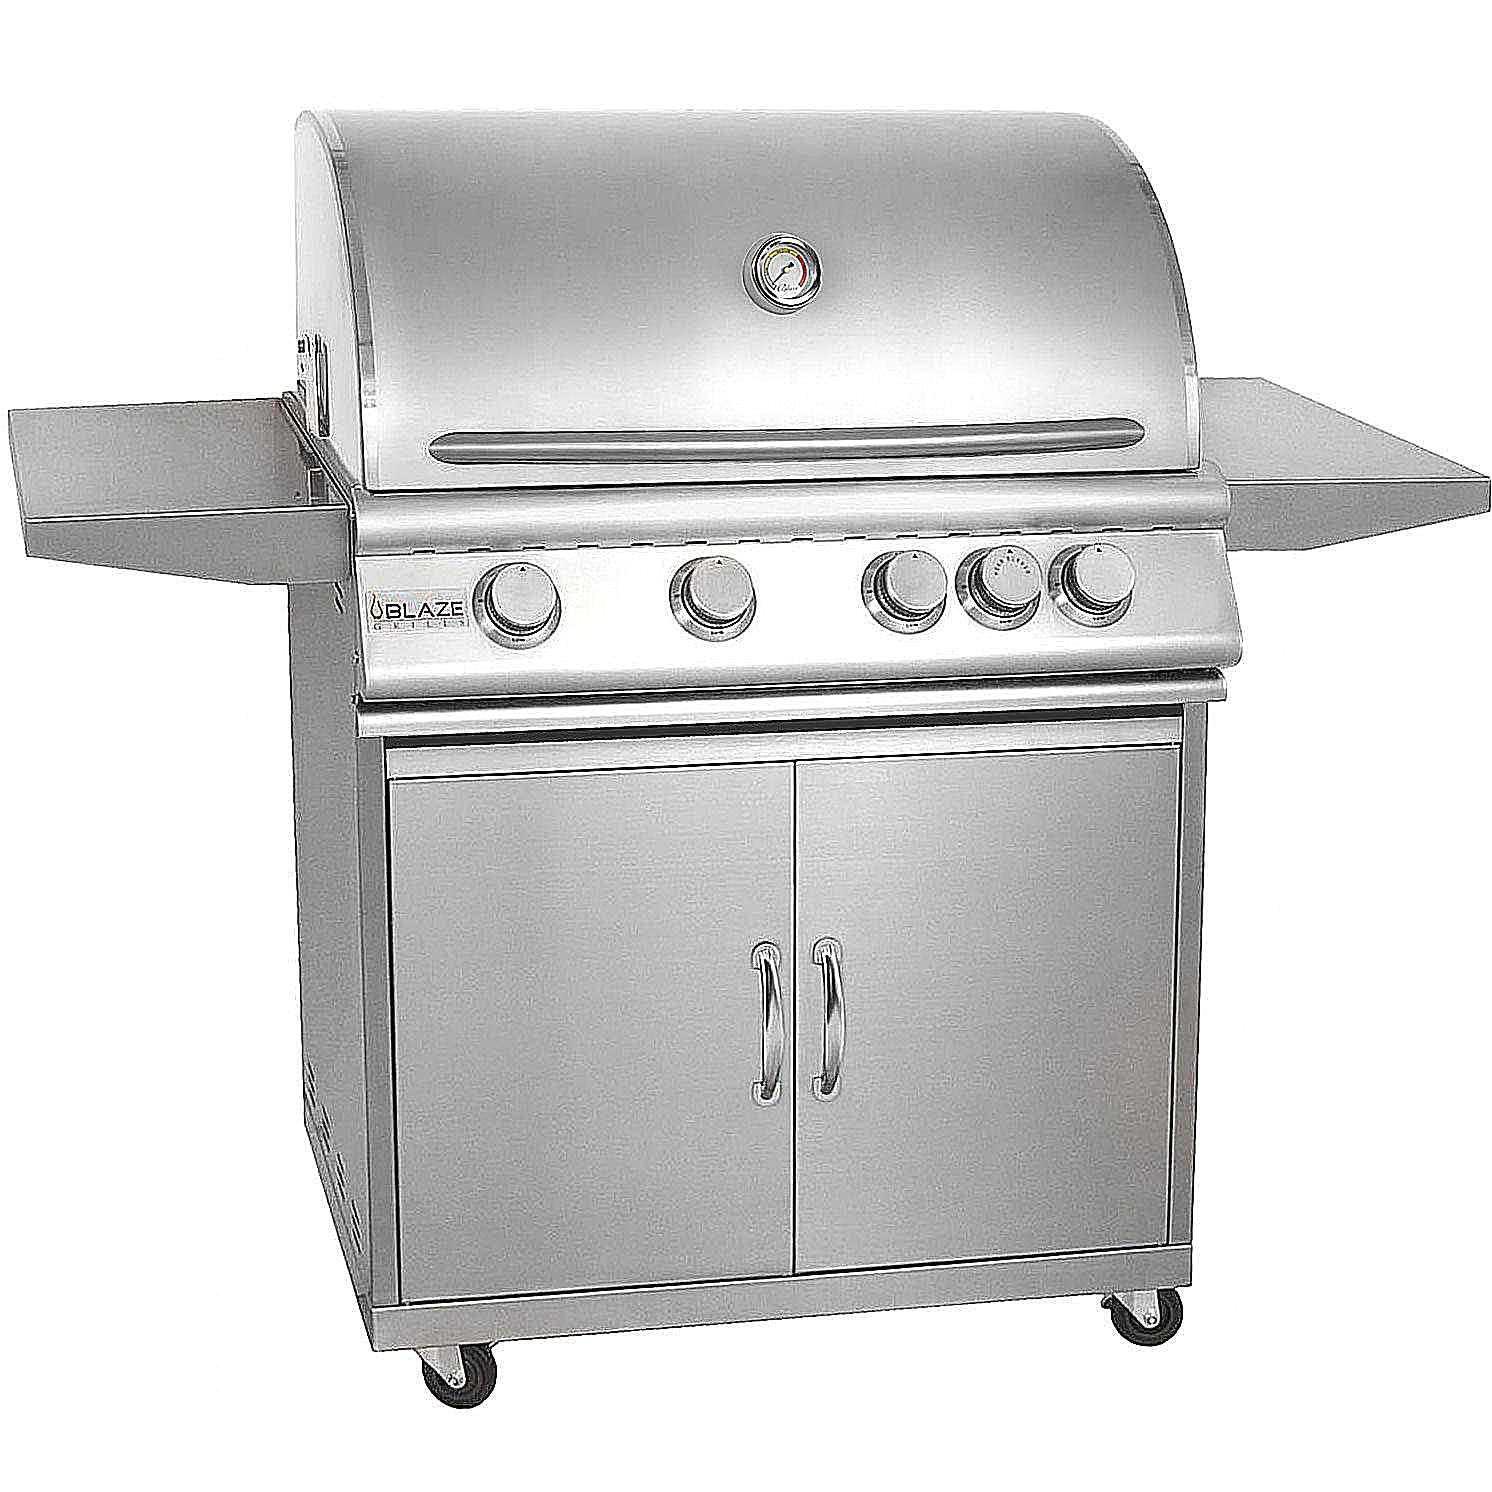 blaze 32 inch 4 burner gas grill model blz 4 lp